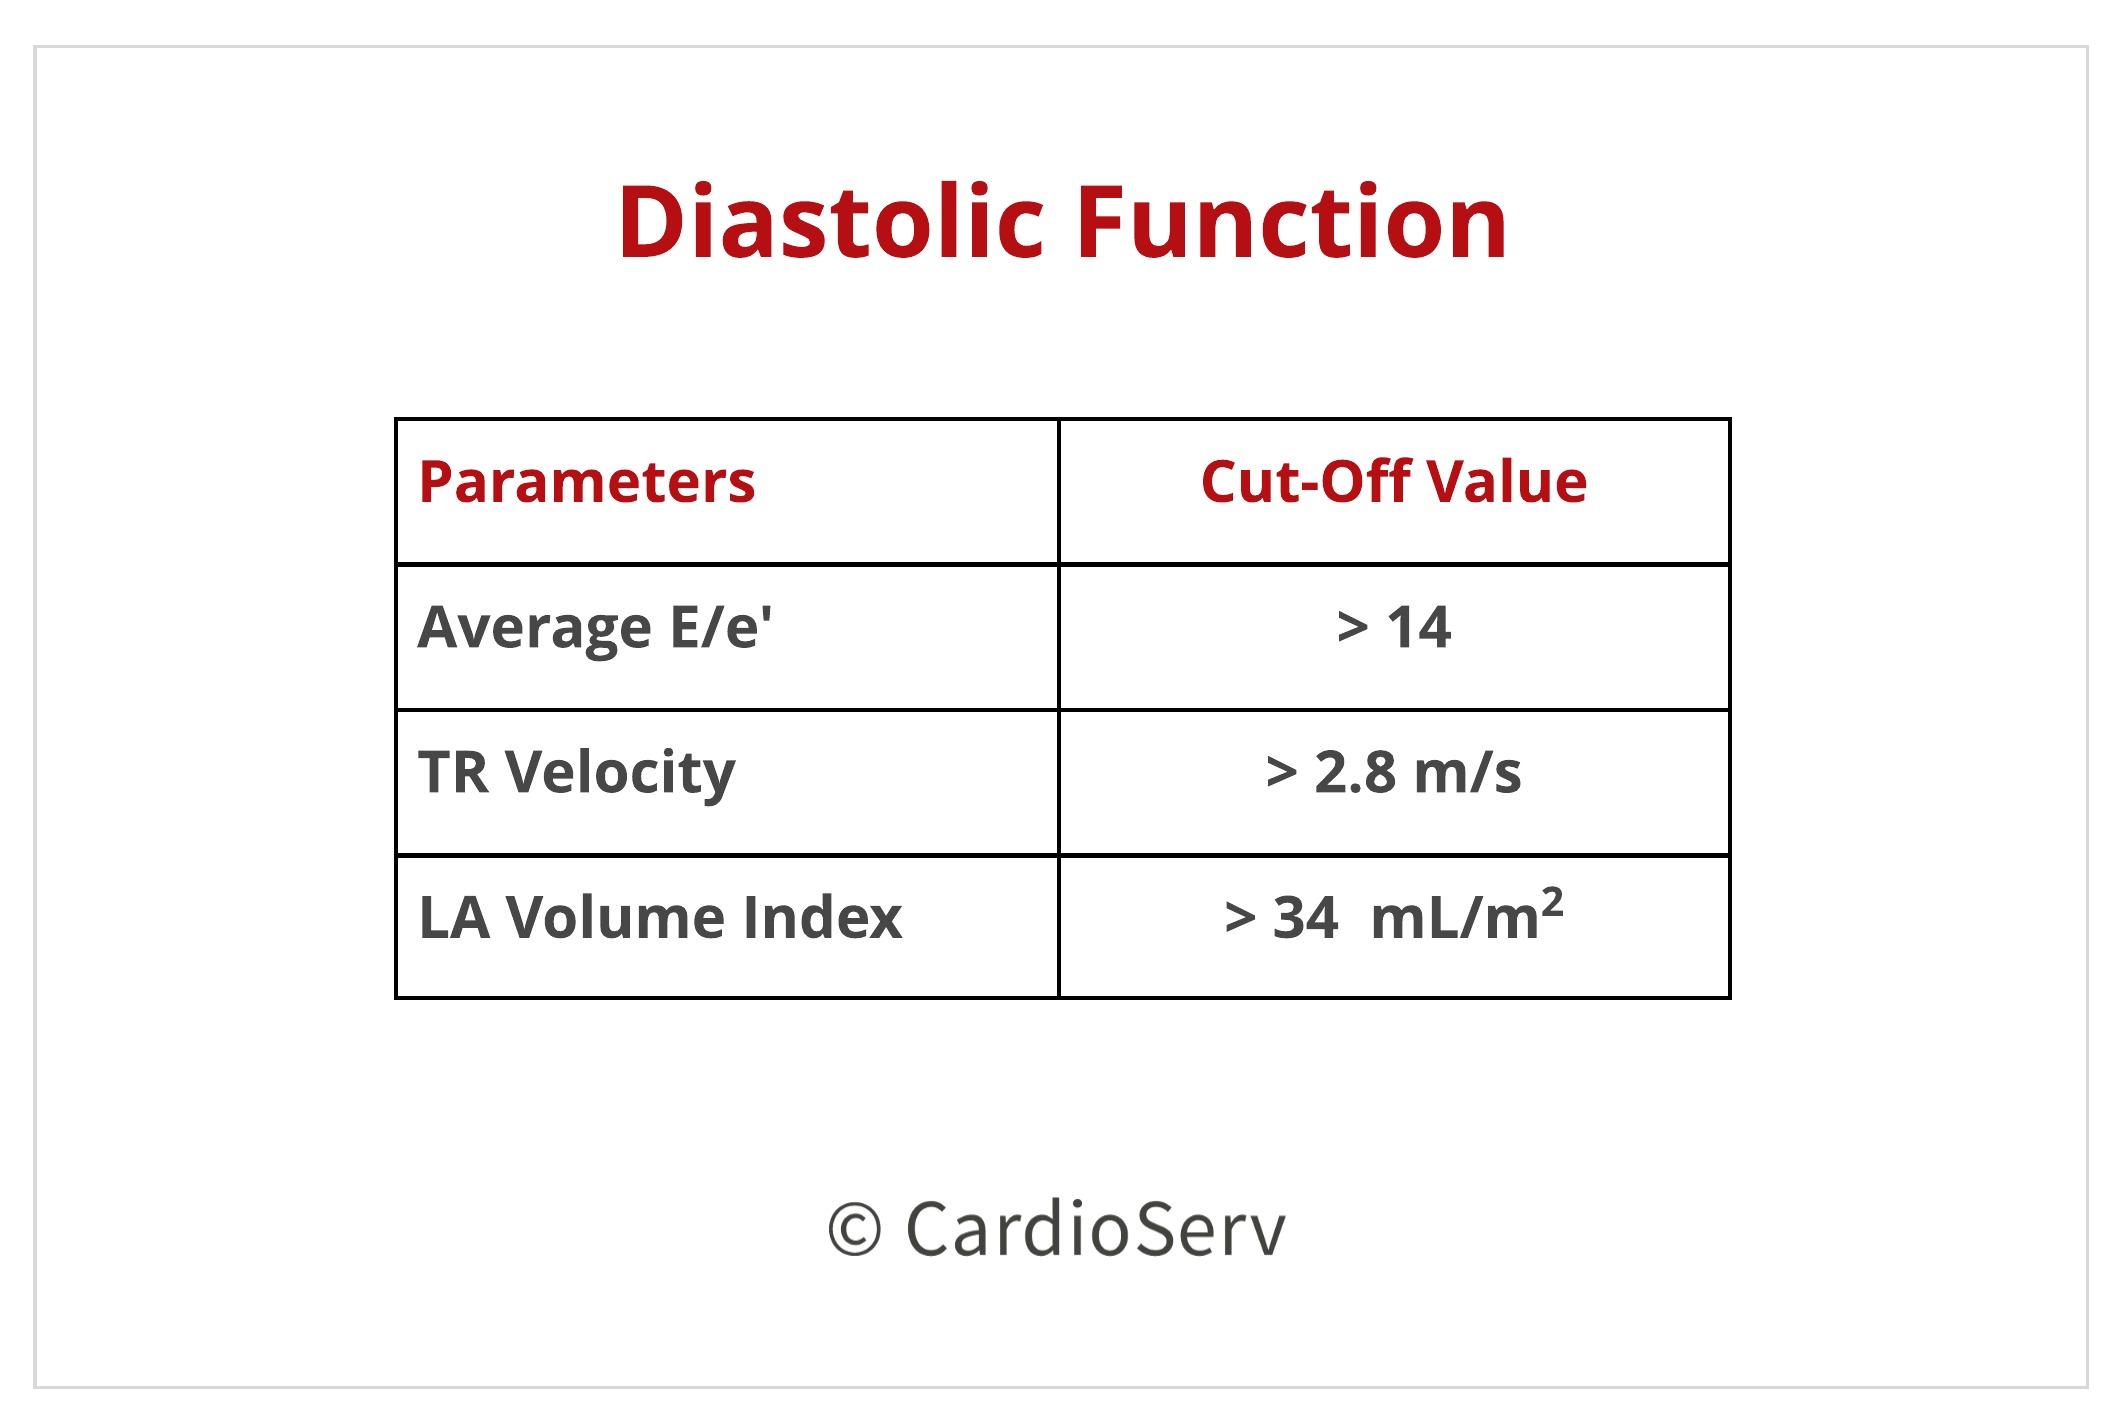 Diastolic Function Parameters